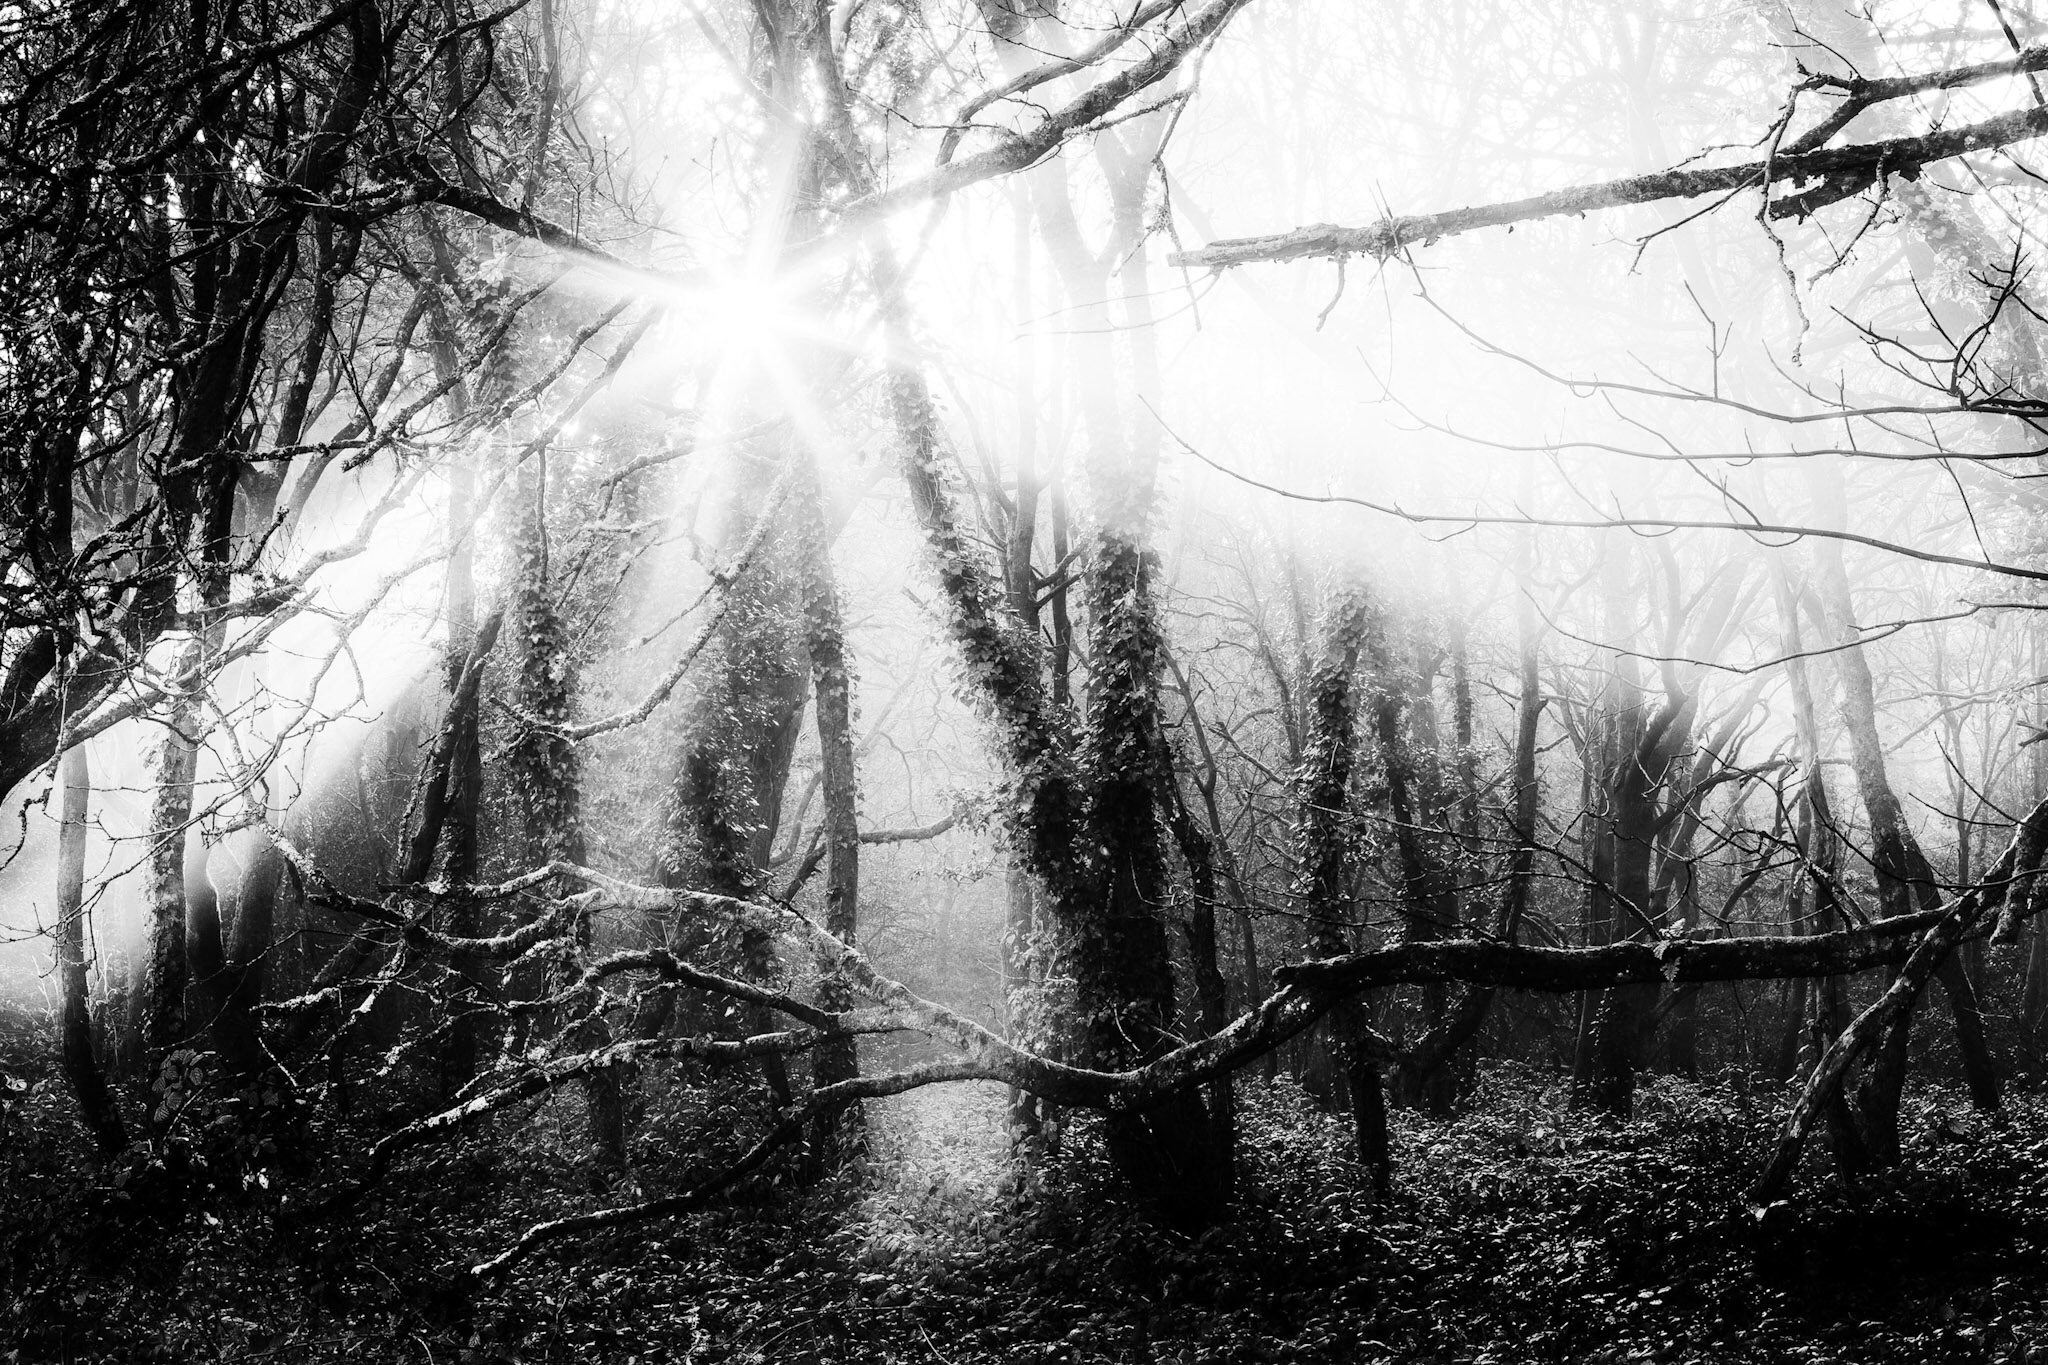 Delph Woods, Broadstone, by Rick McEvoy Poole Photographer